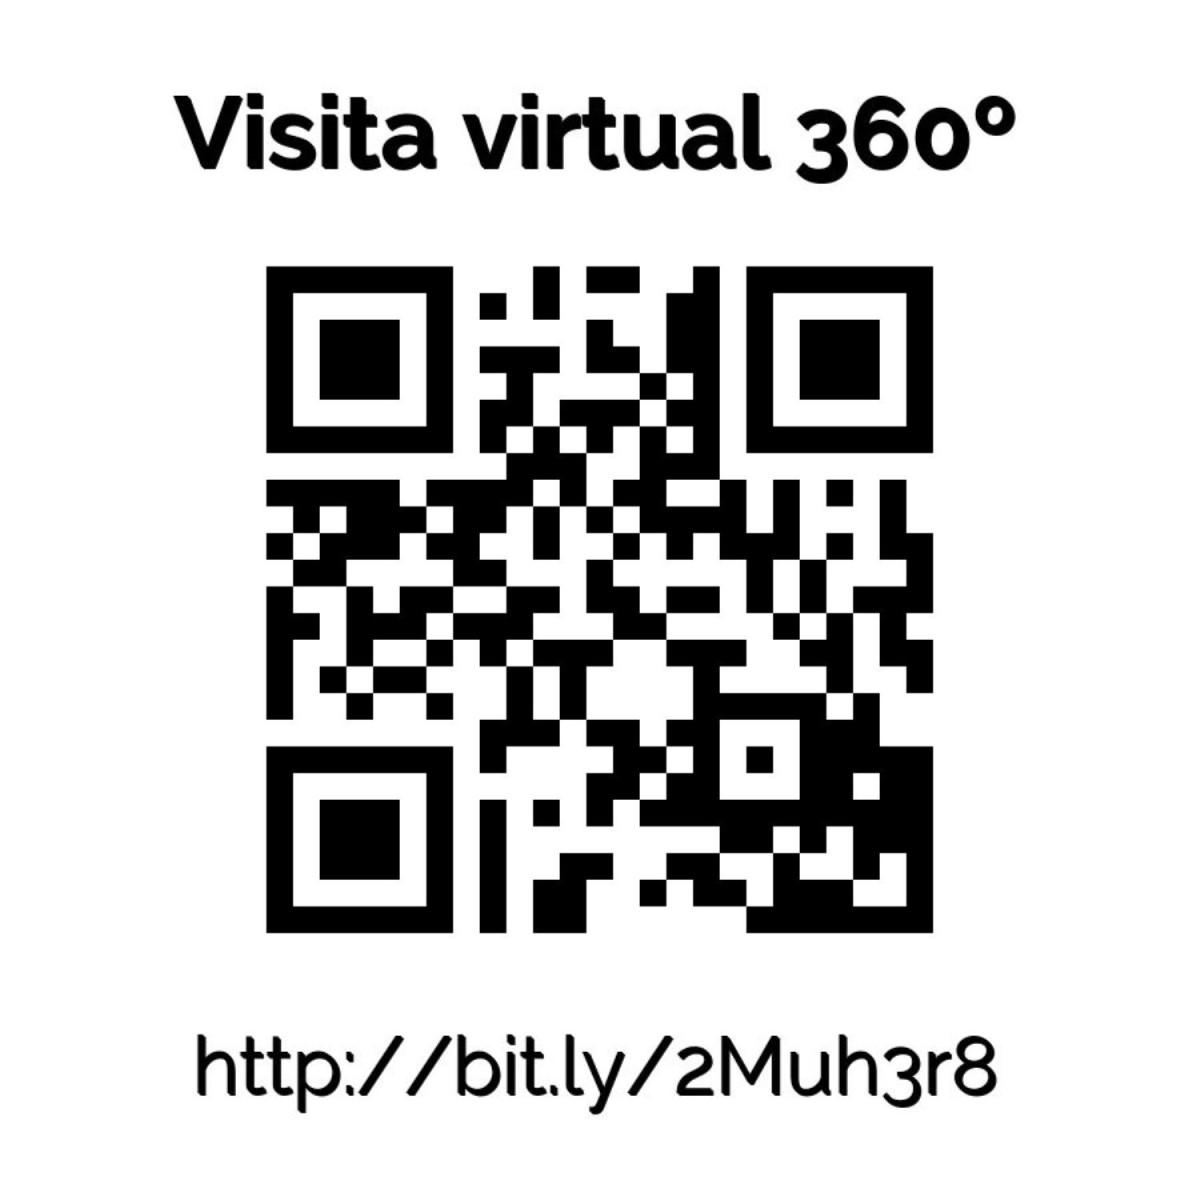 3408-03725